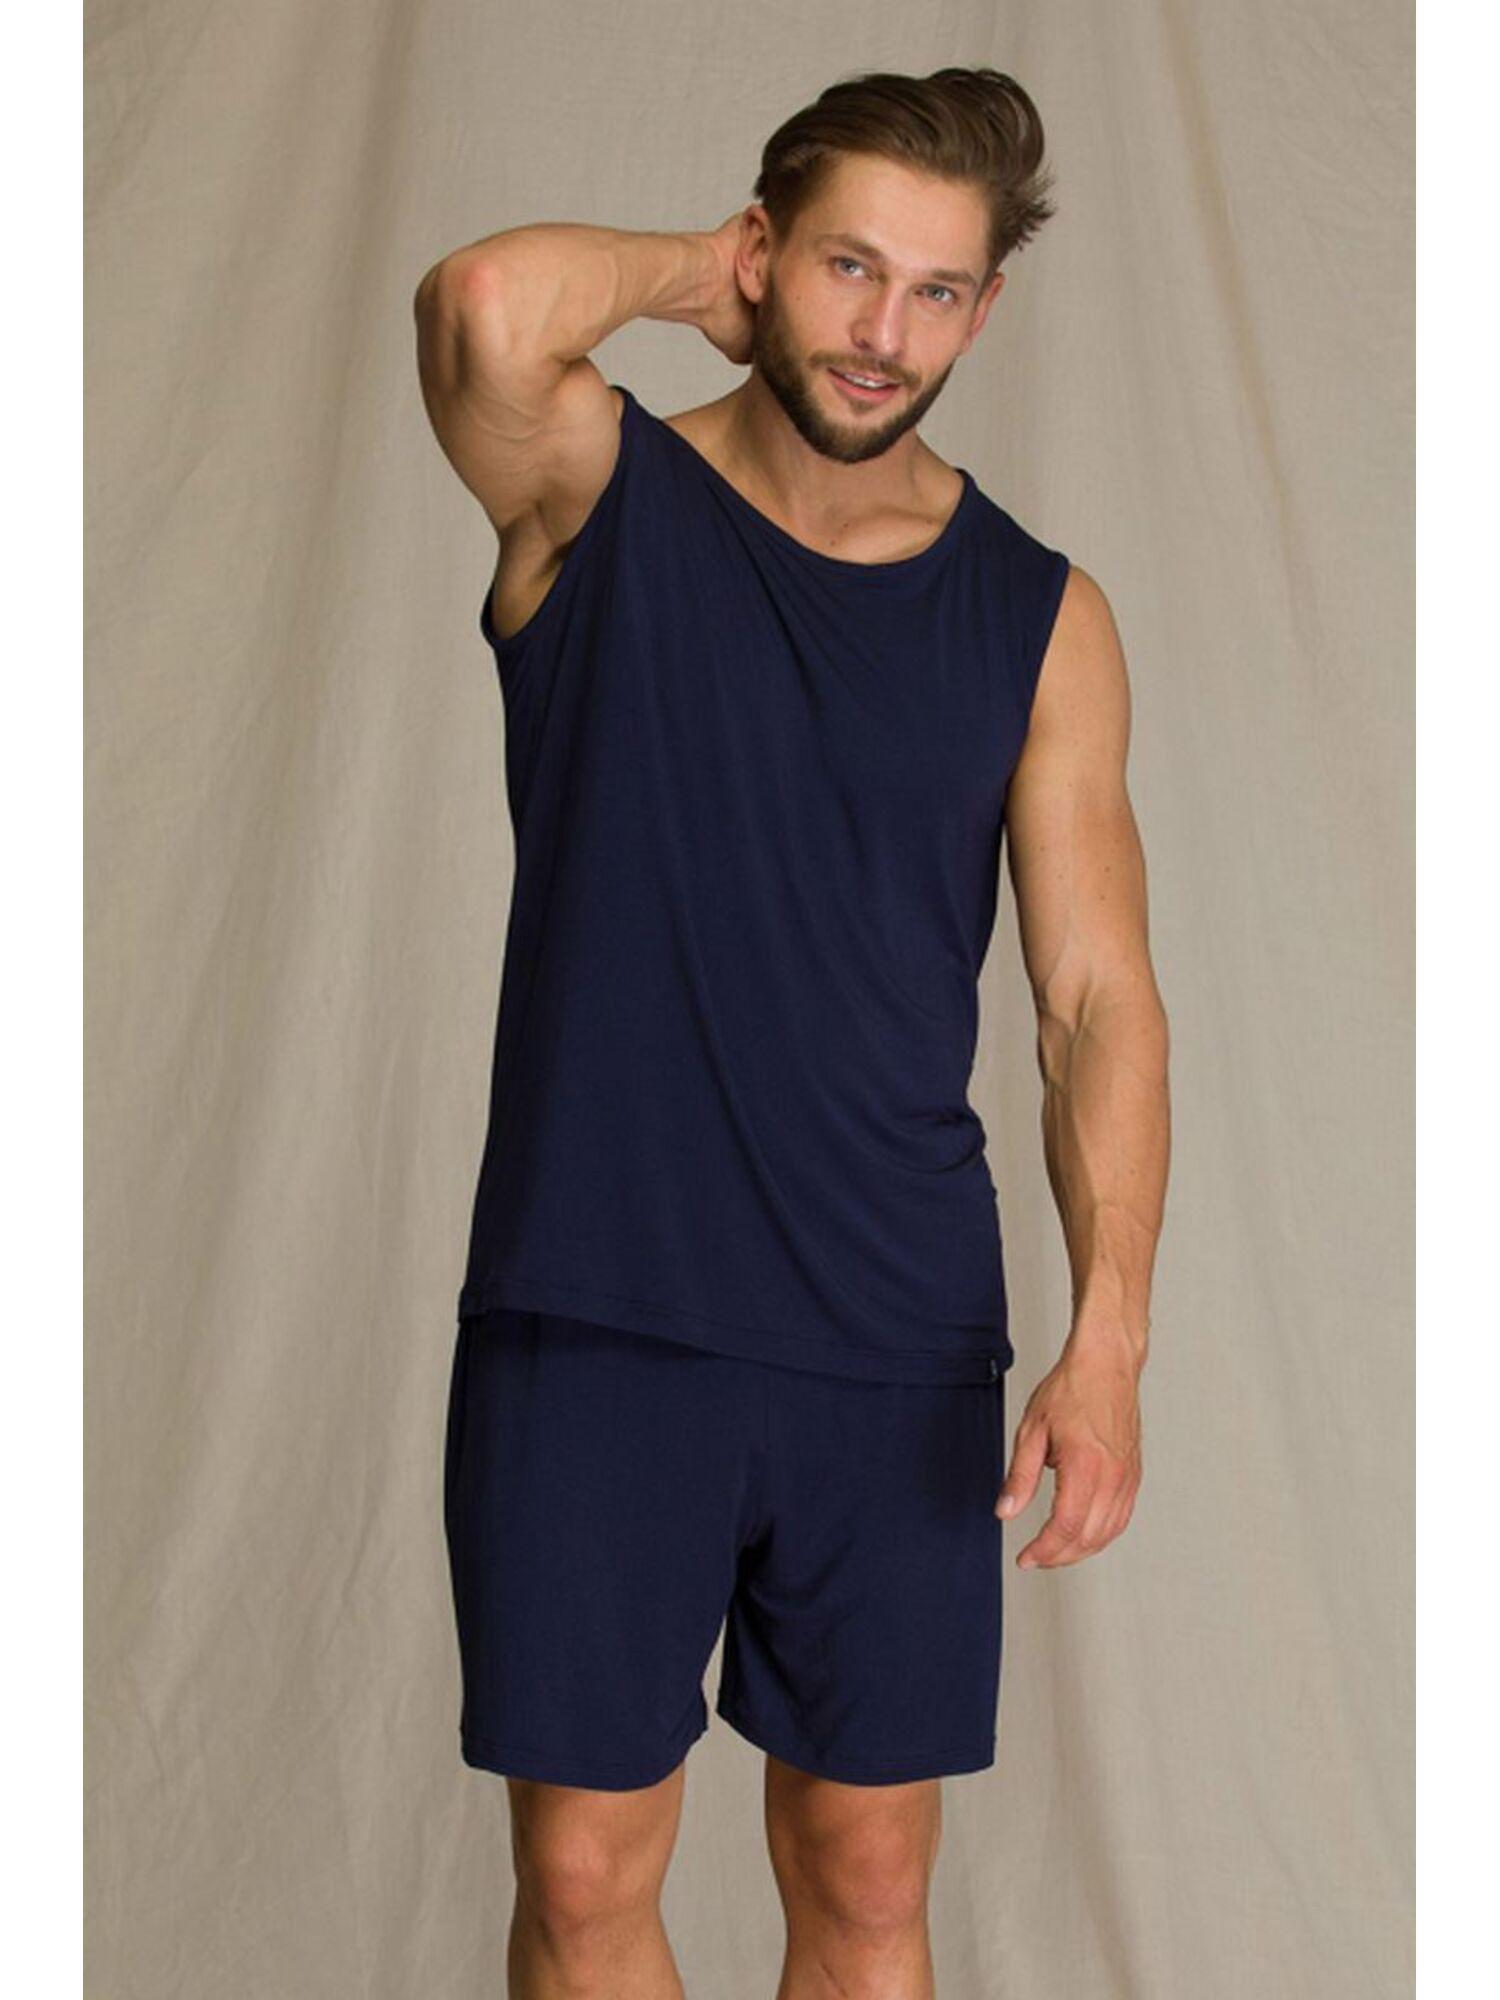 Пижама мужская с шортами MNS 001 A21, синий, KEY